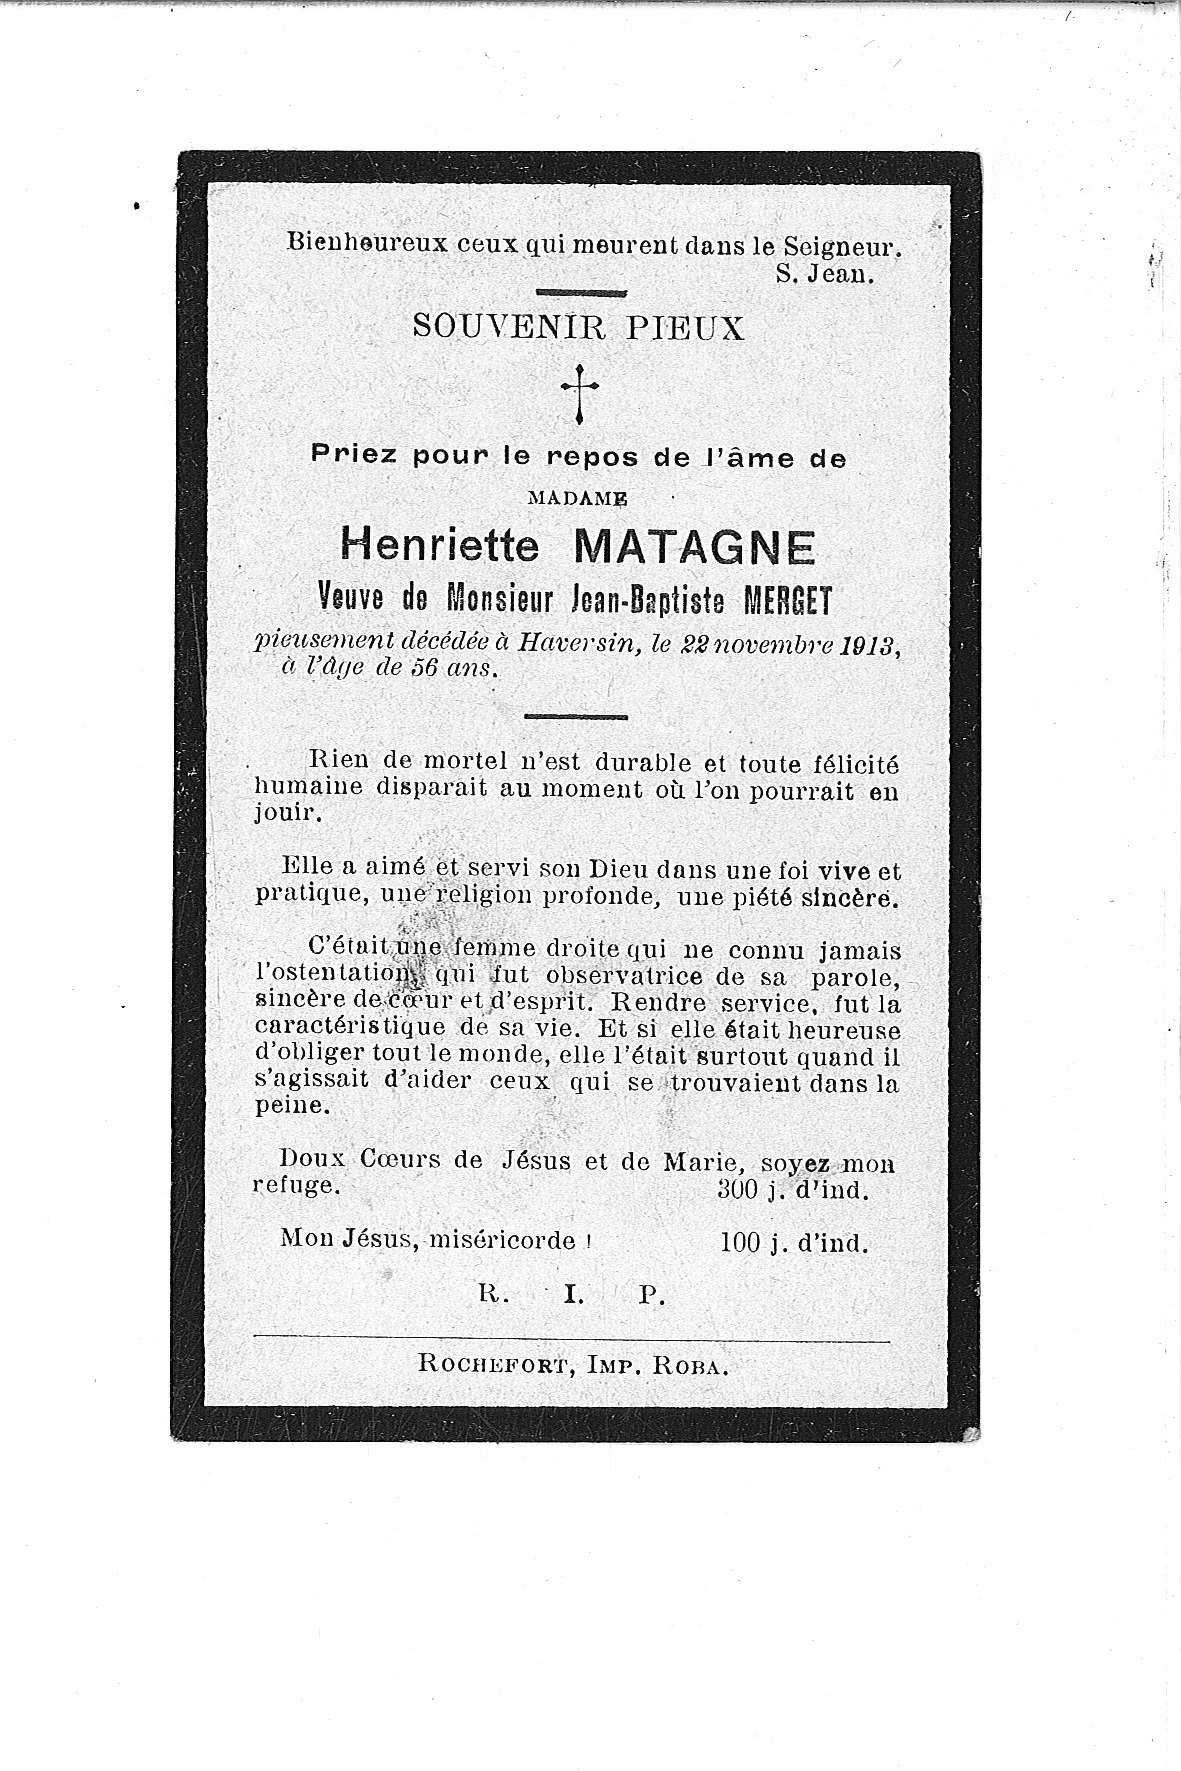 Henriette(1913)20120227085536_00050.jpg